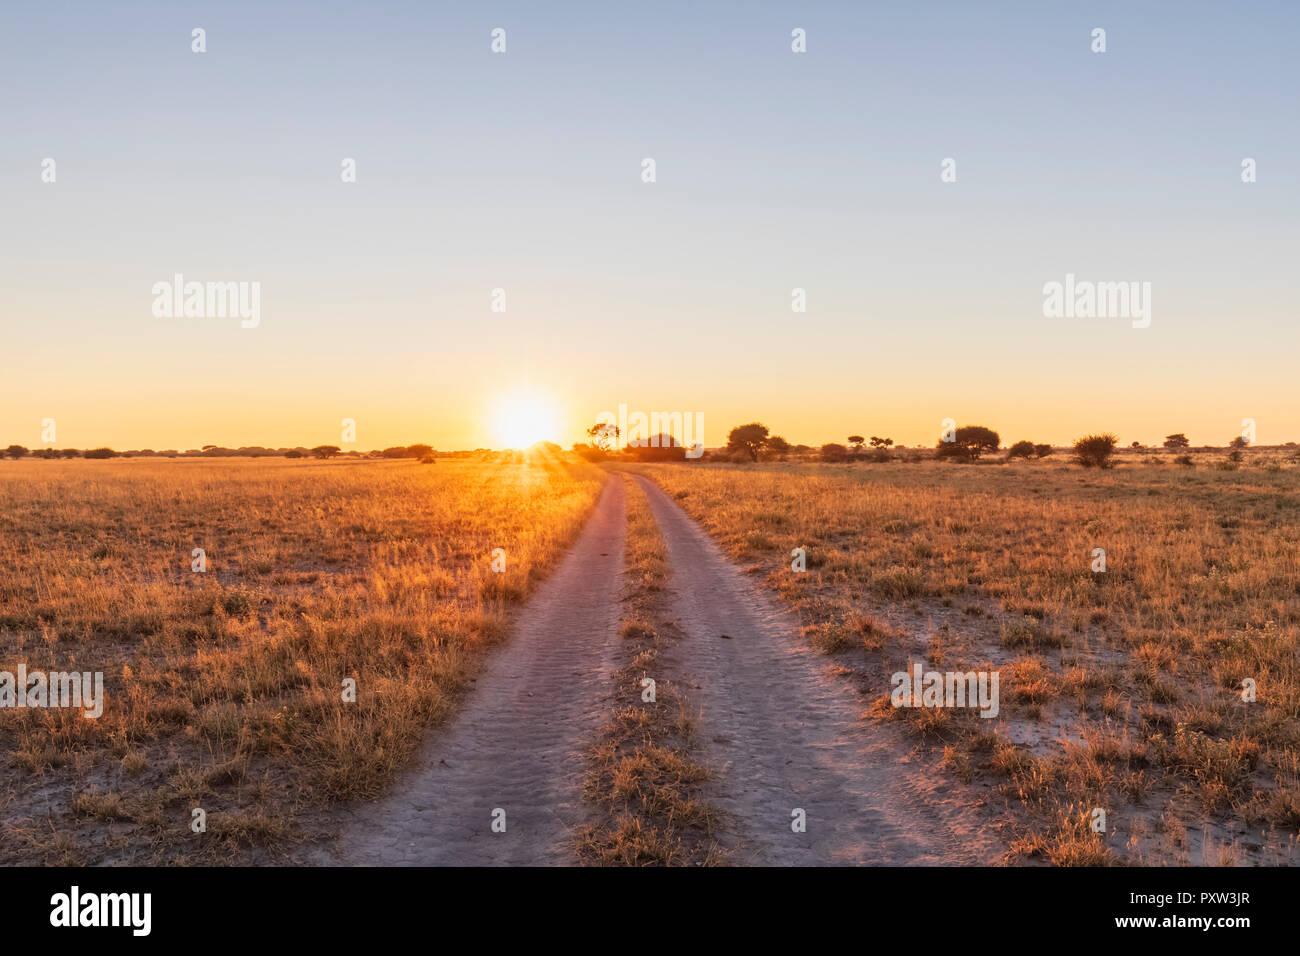 Botswana, Kalahari, Central Kalahari Game Reserve, piste at sunrise - Stock Image